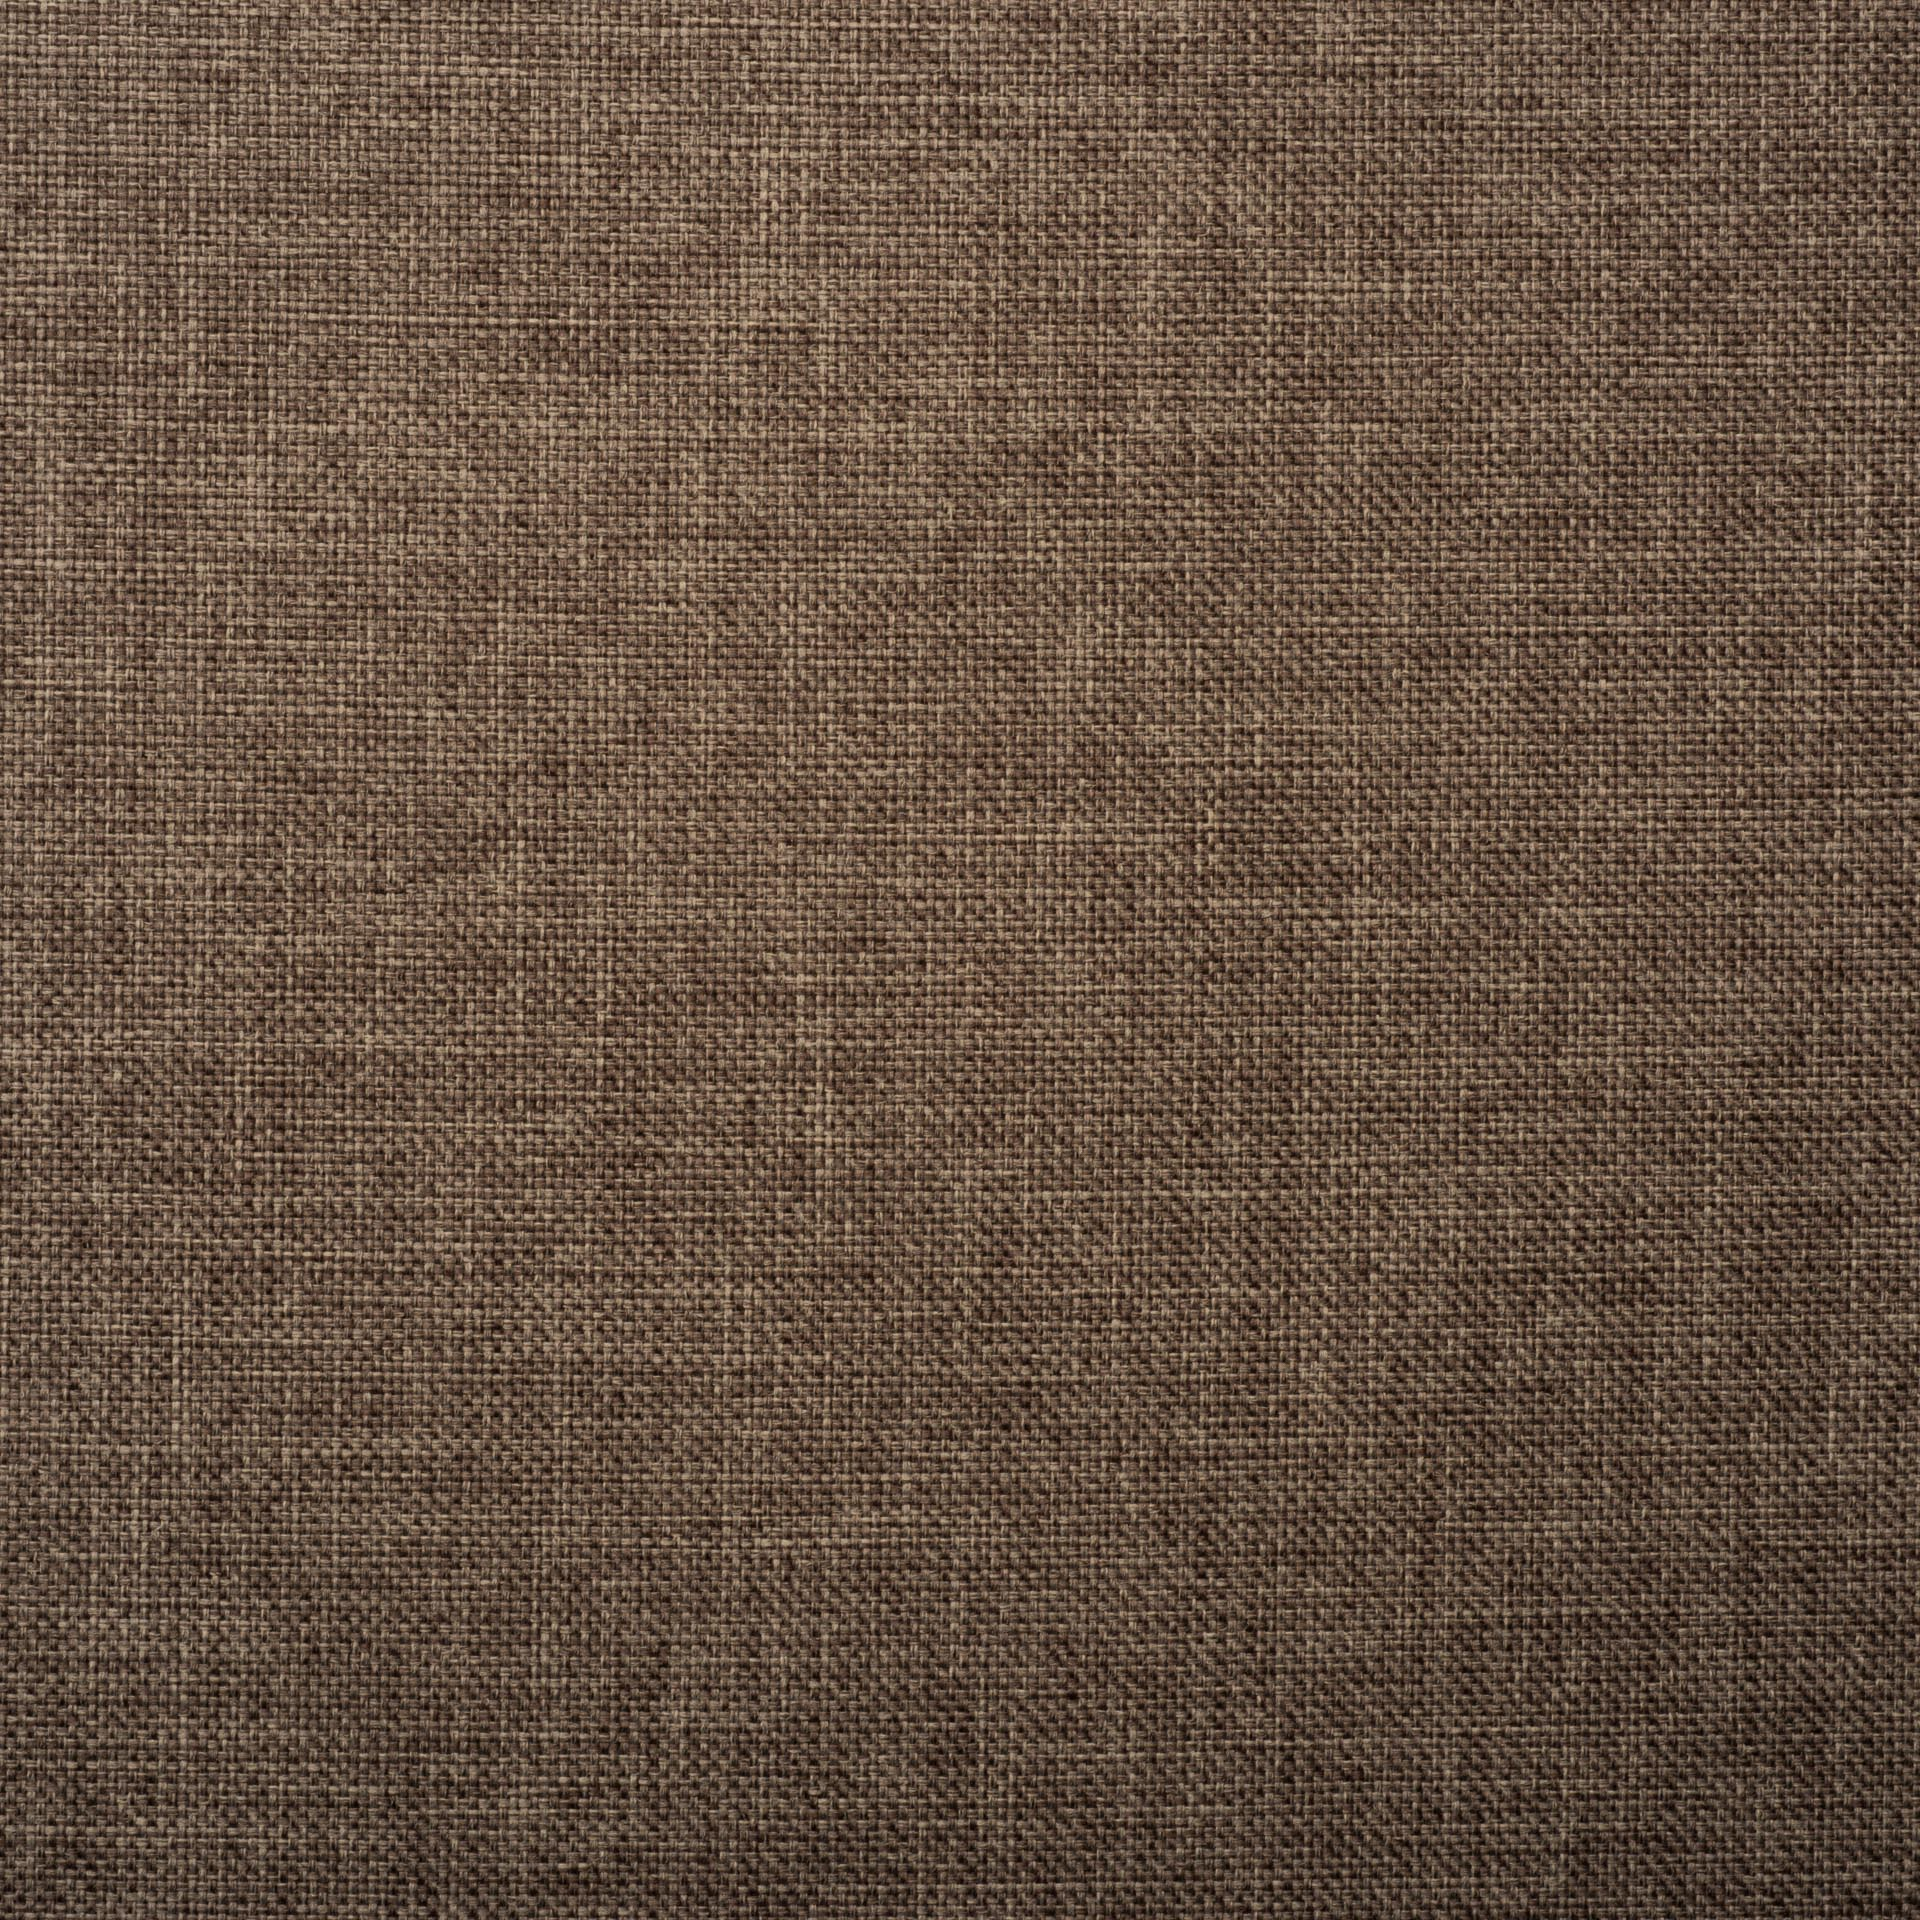 Коллекция ткани Саванна CAPUCHINO 03,  купить ткань Жаккард для мебели Украина